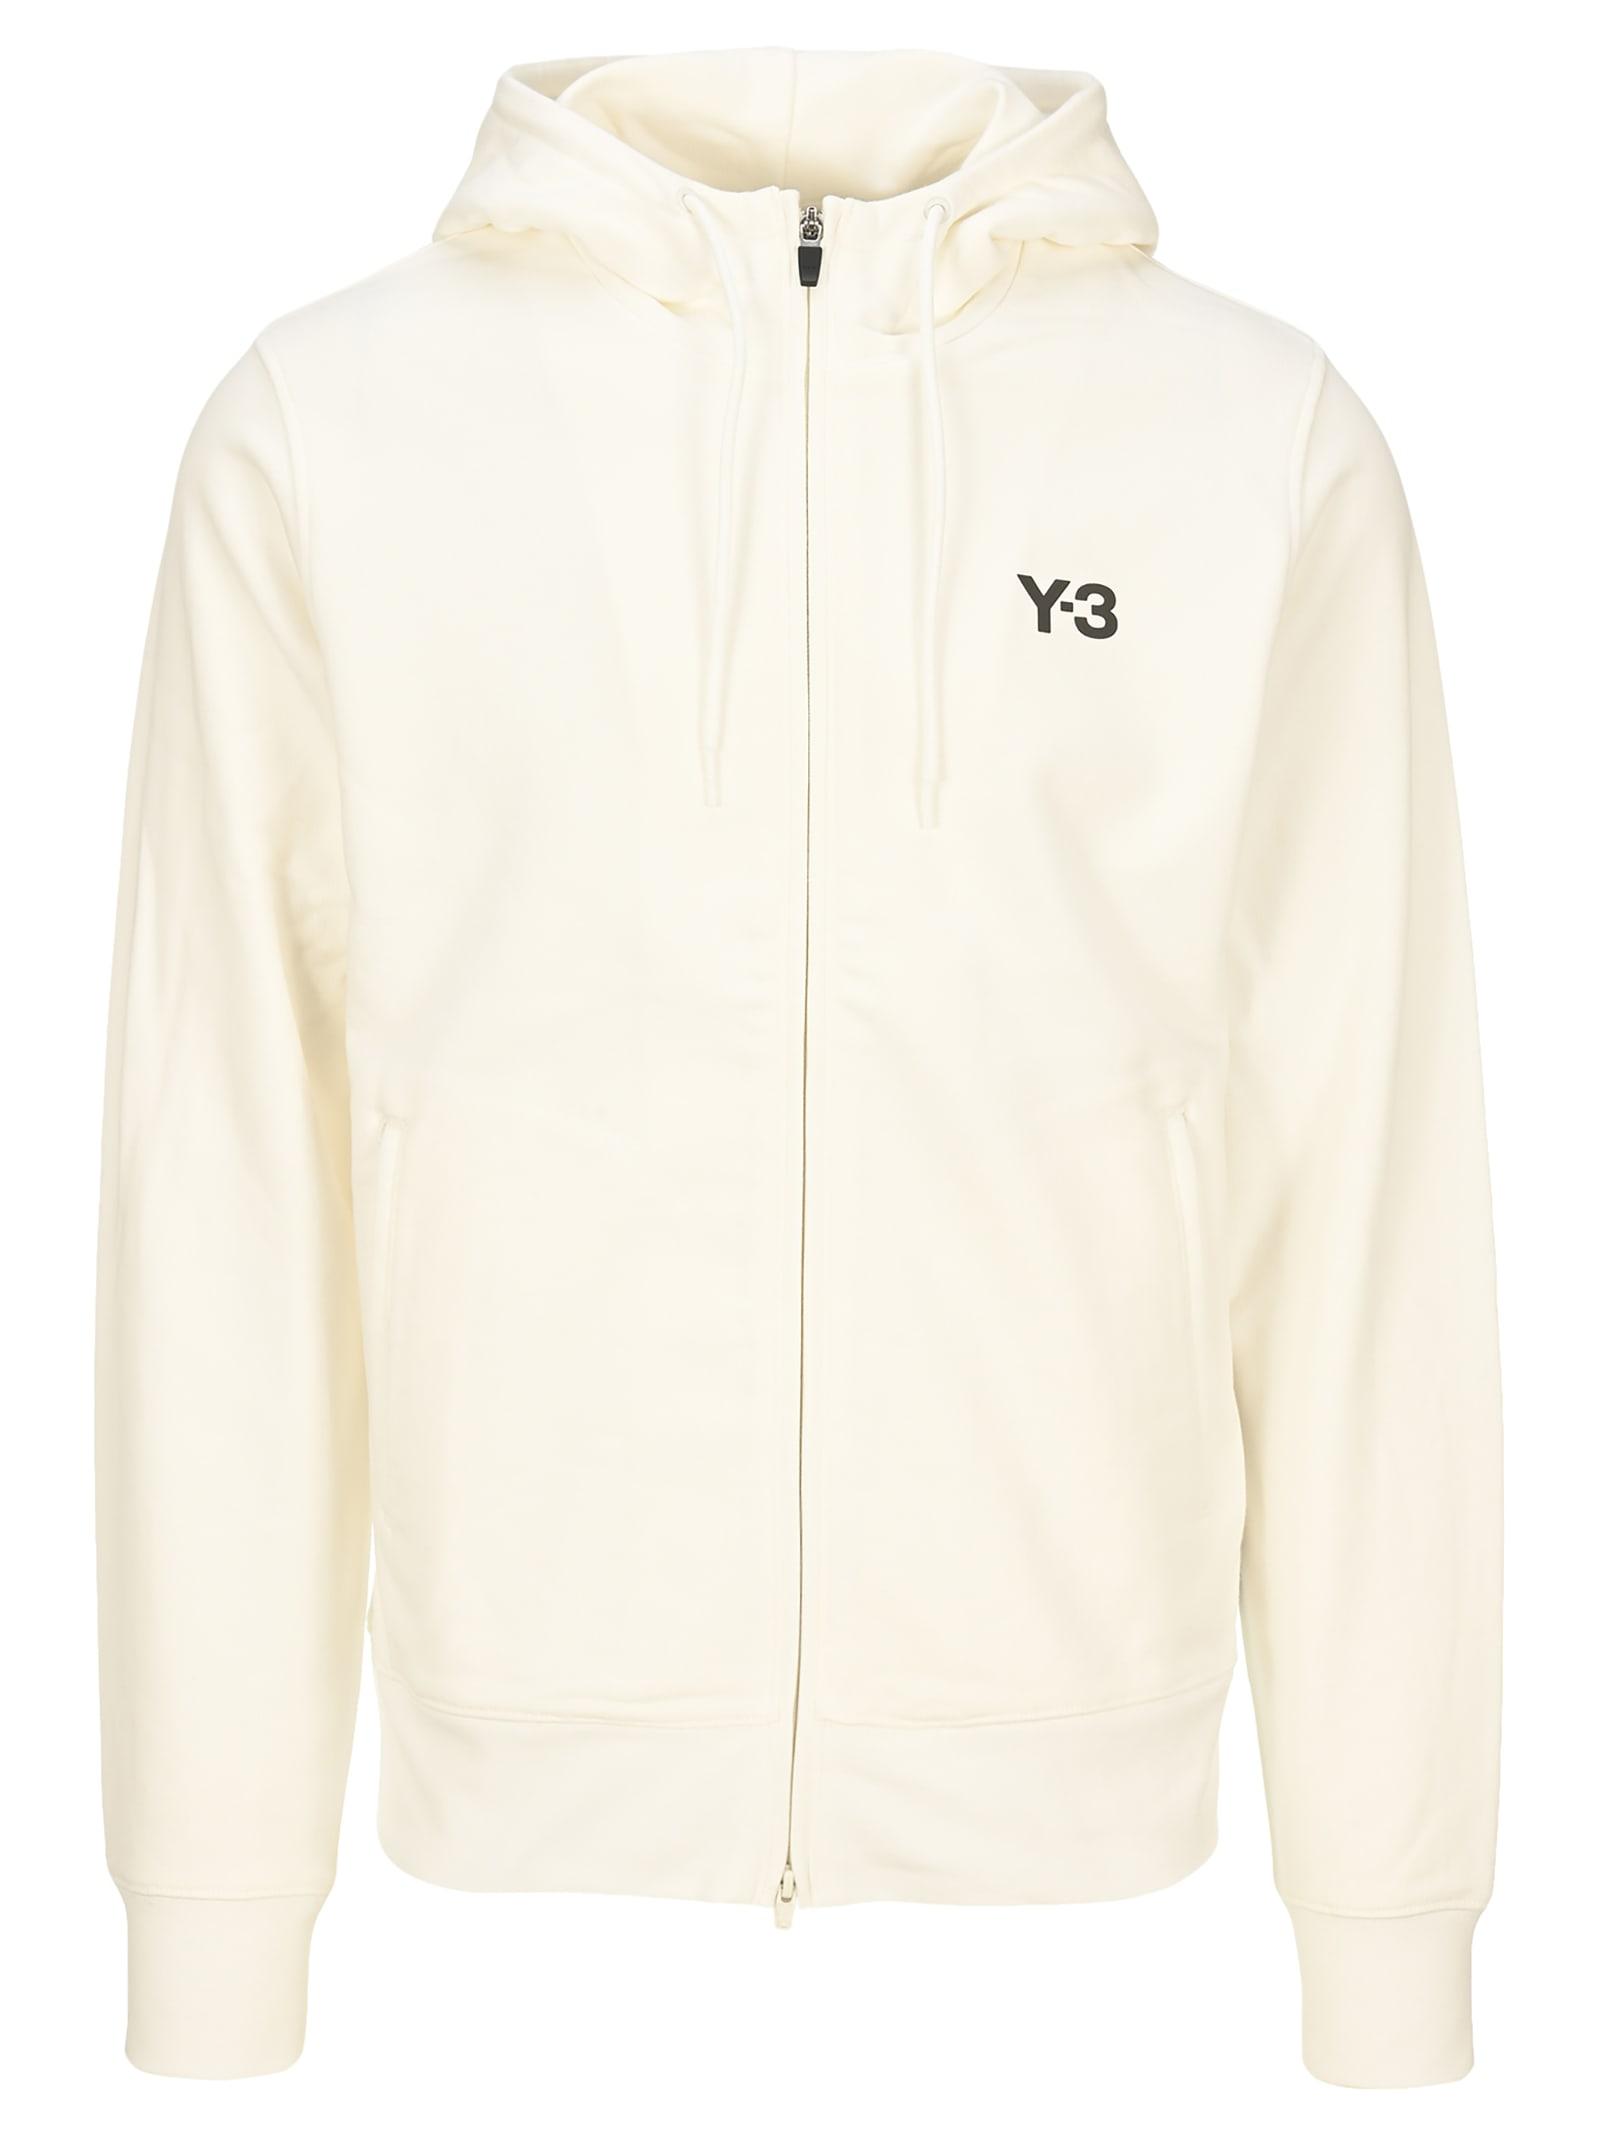 Adidas Y3 Graphic Hoodie